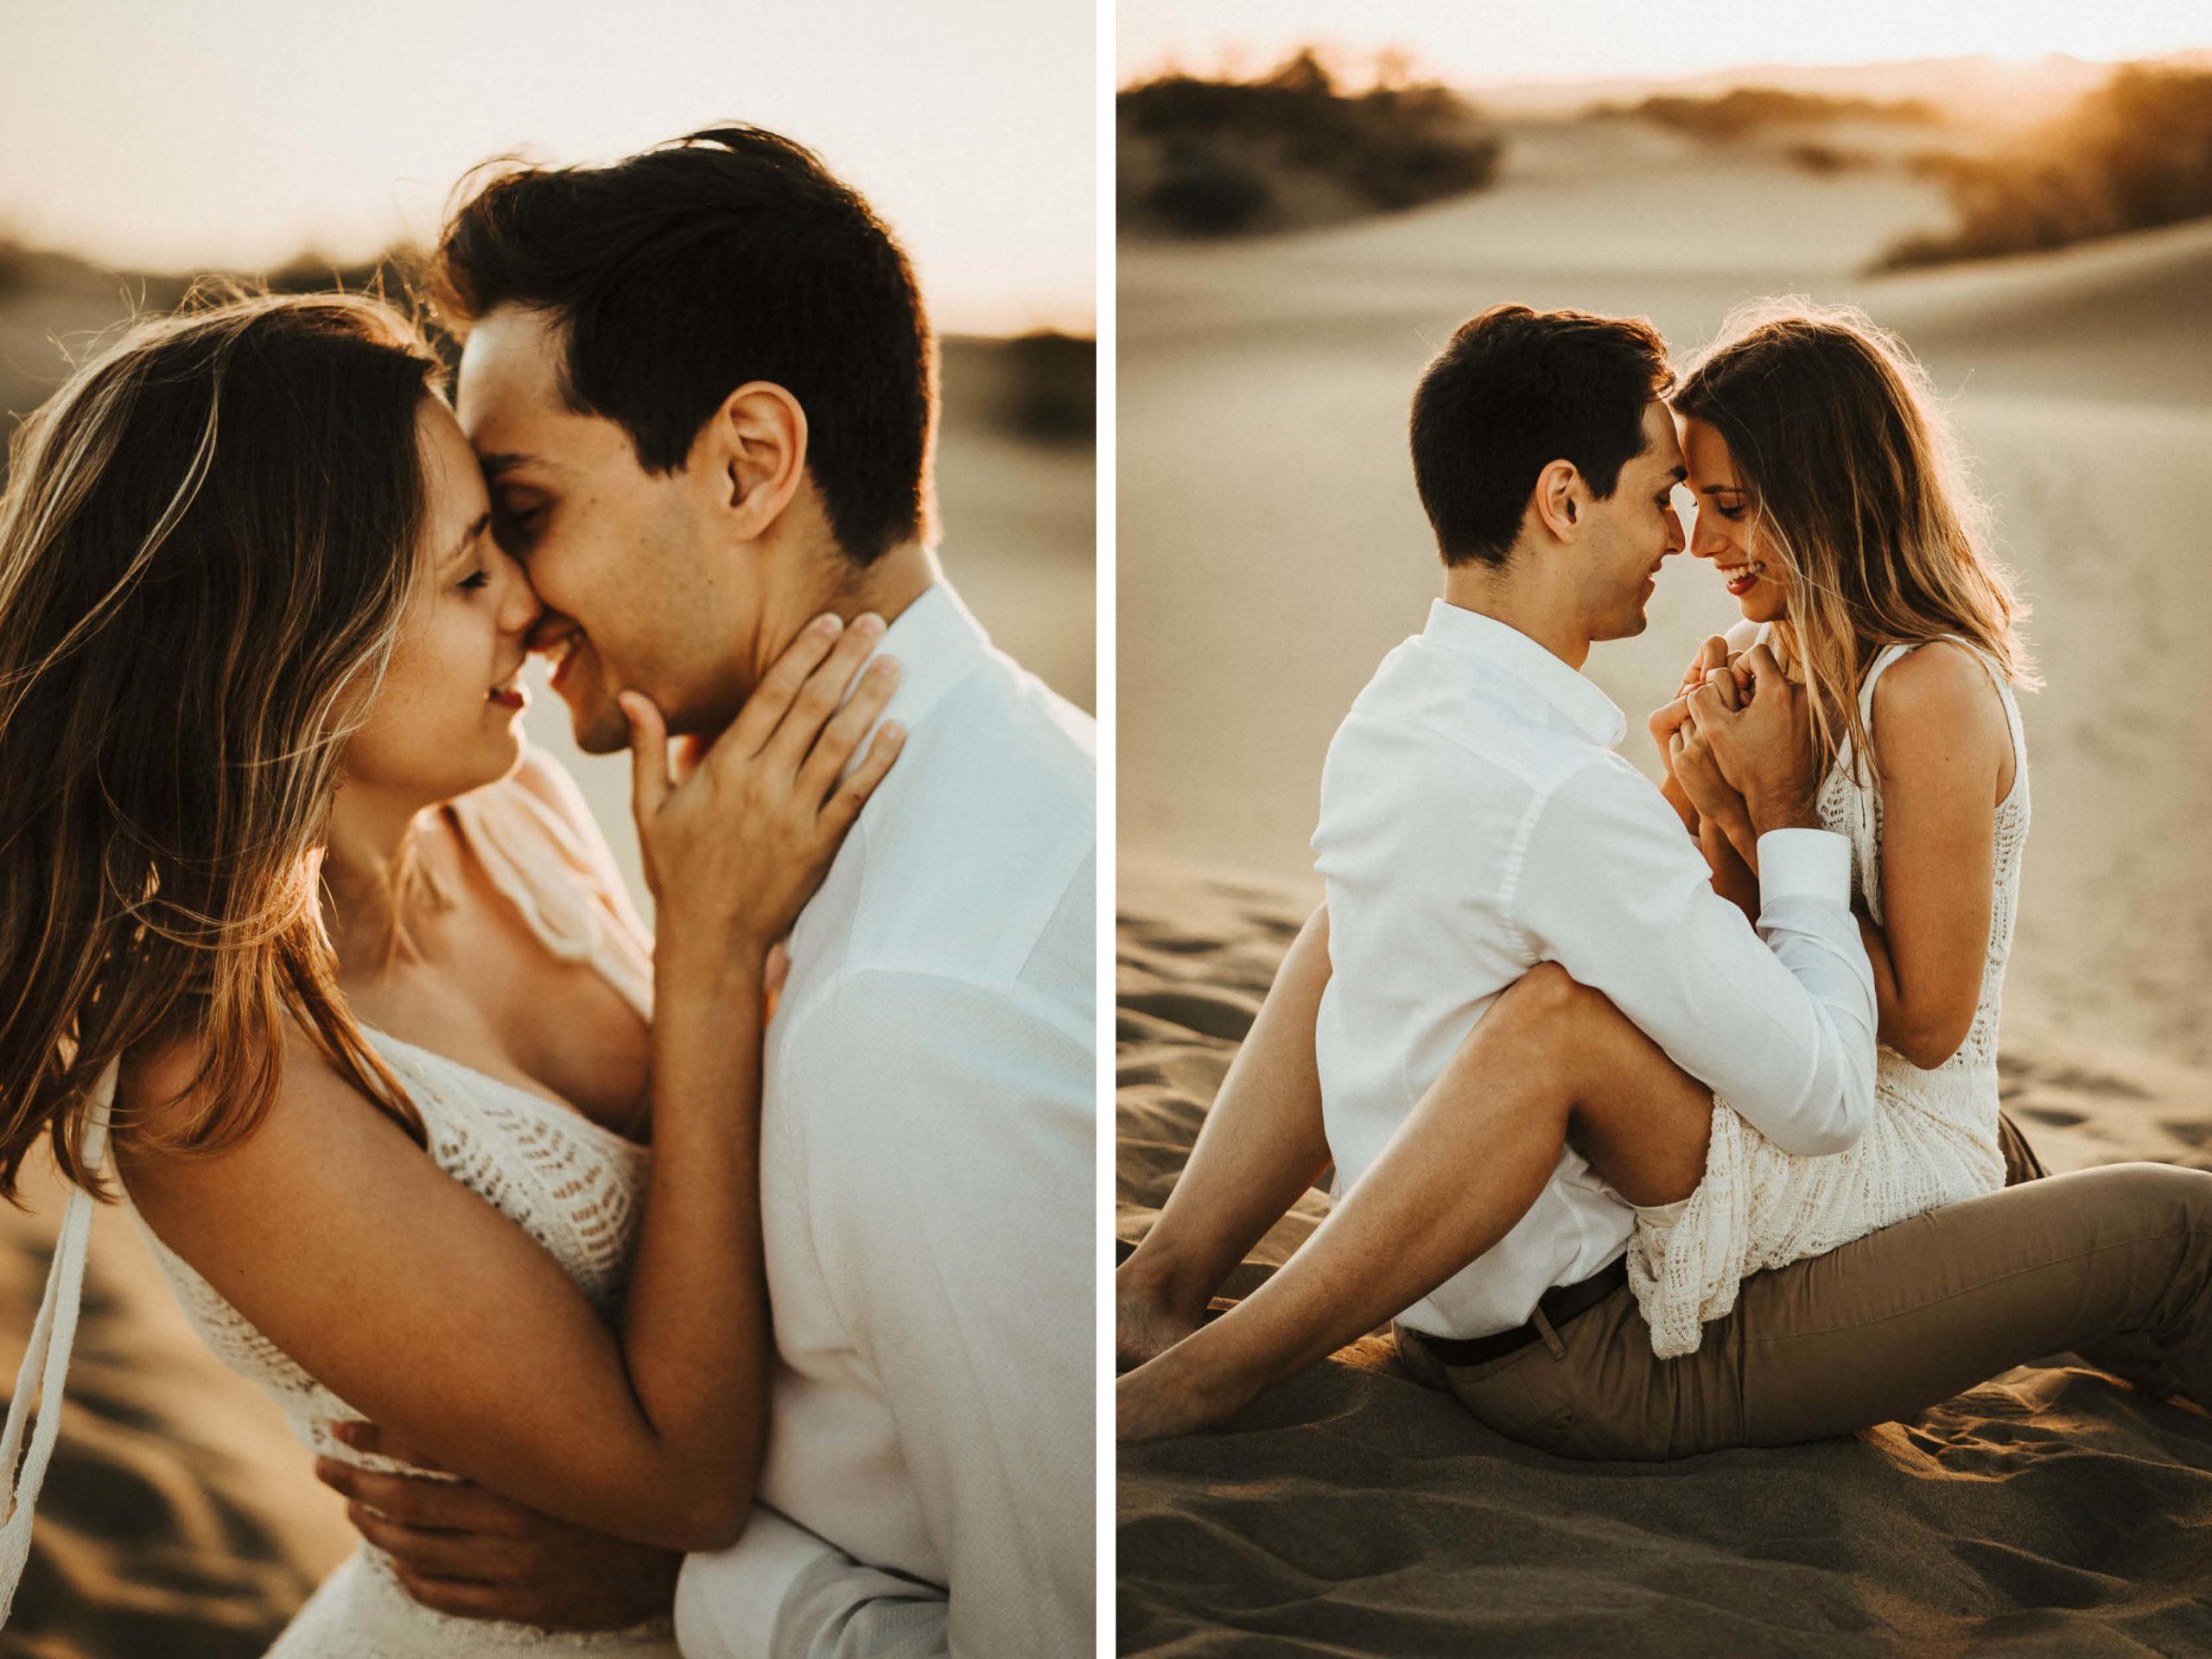 Destination Wedding - Karina Sowa Wedding Photography